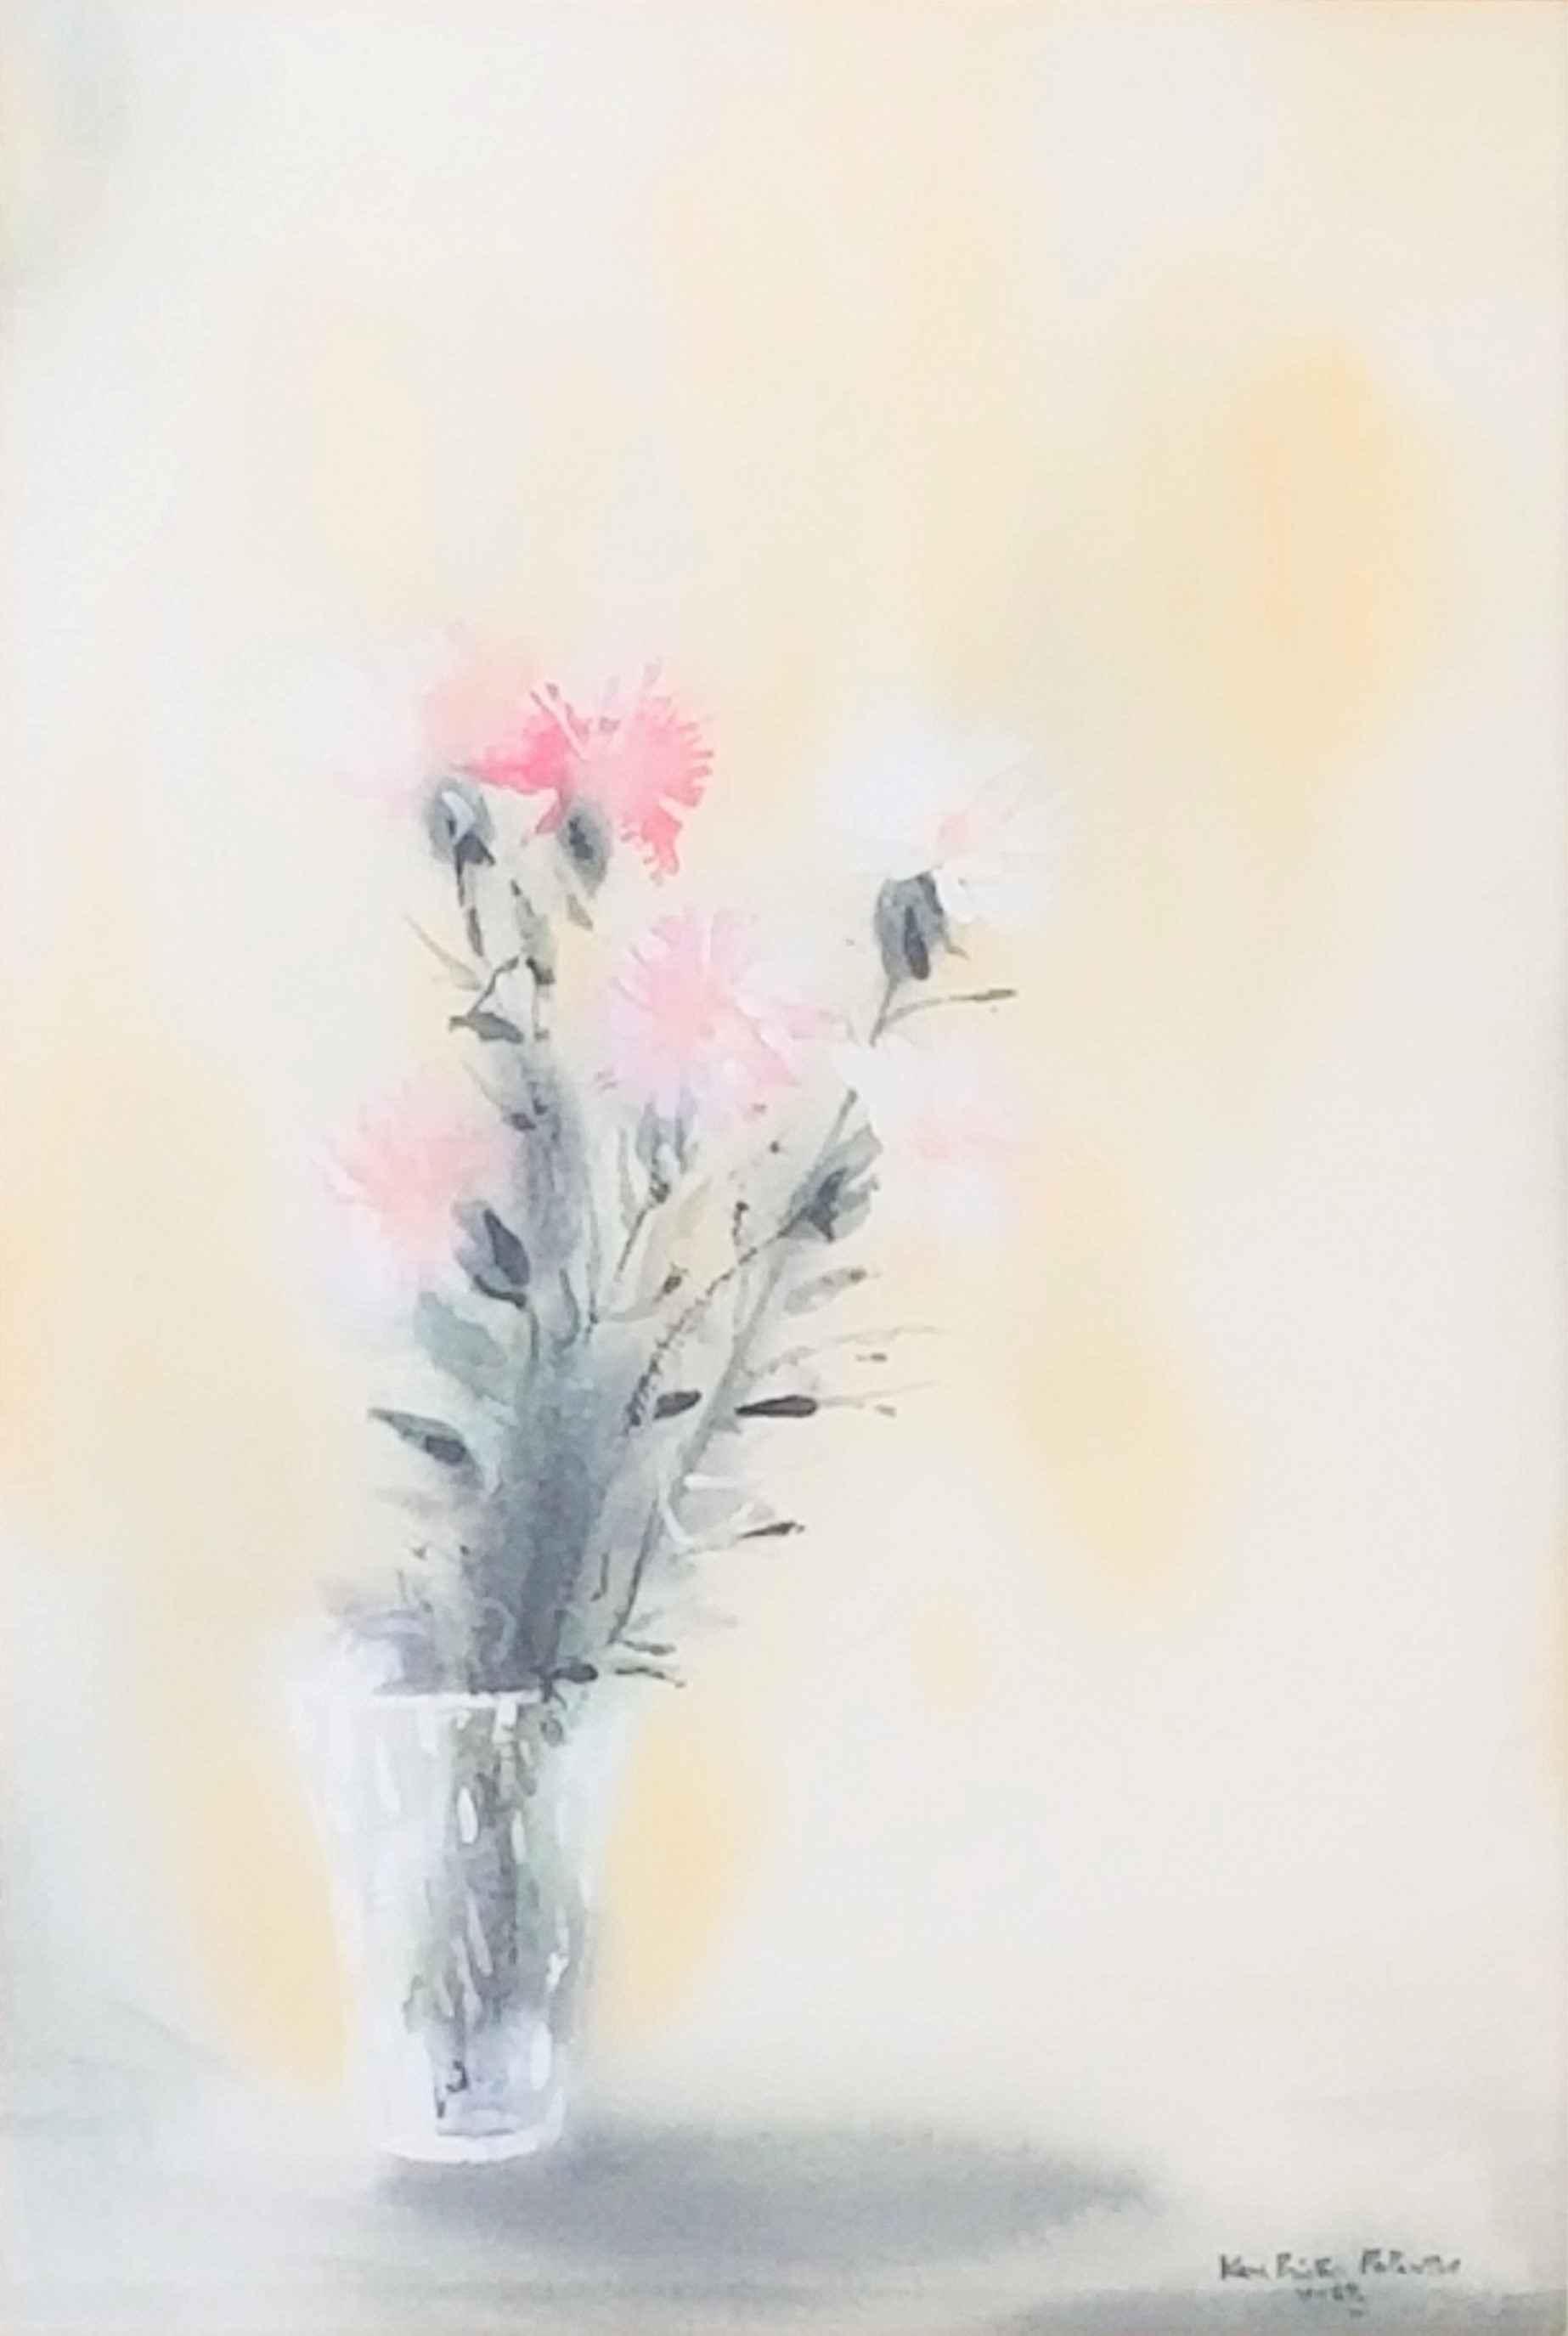 Untitled (Botanical) by Mr. Karl Priebe - Masterpiece Online